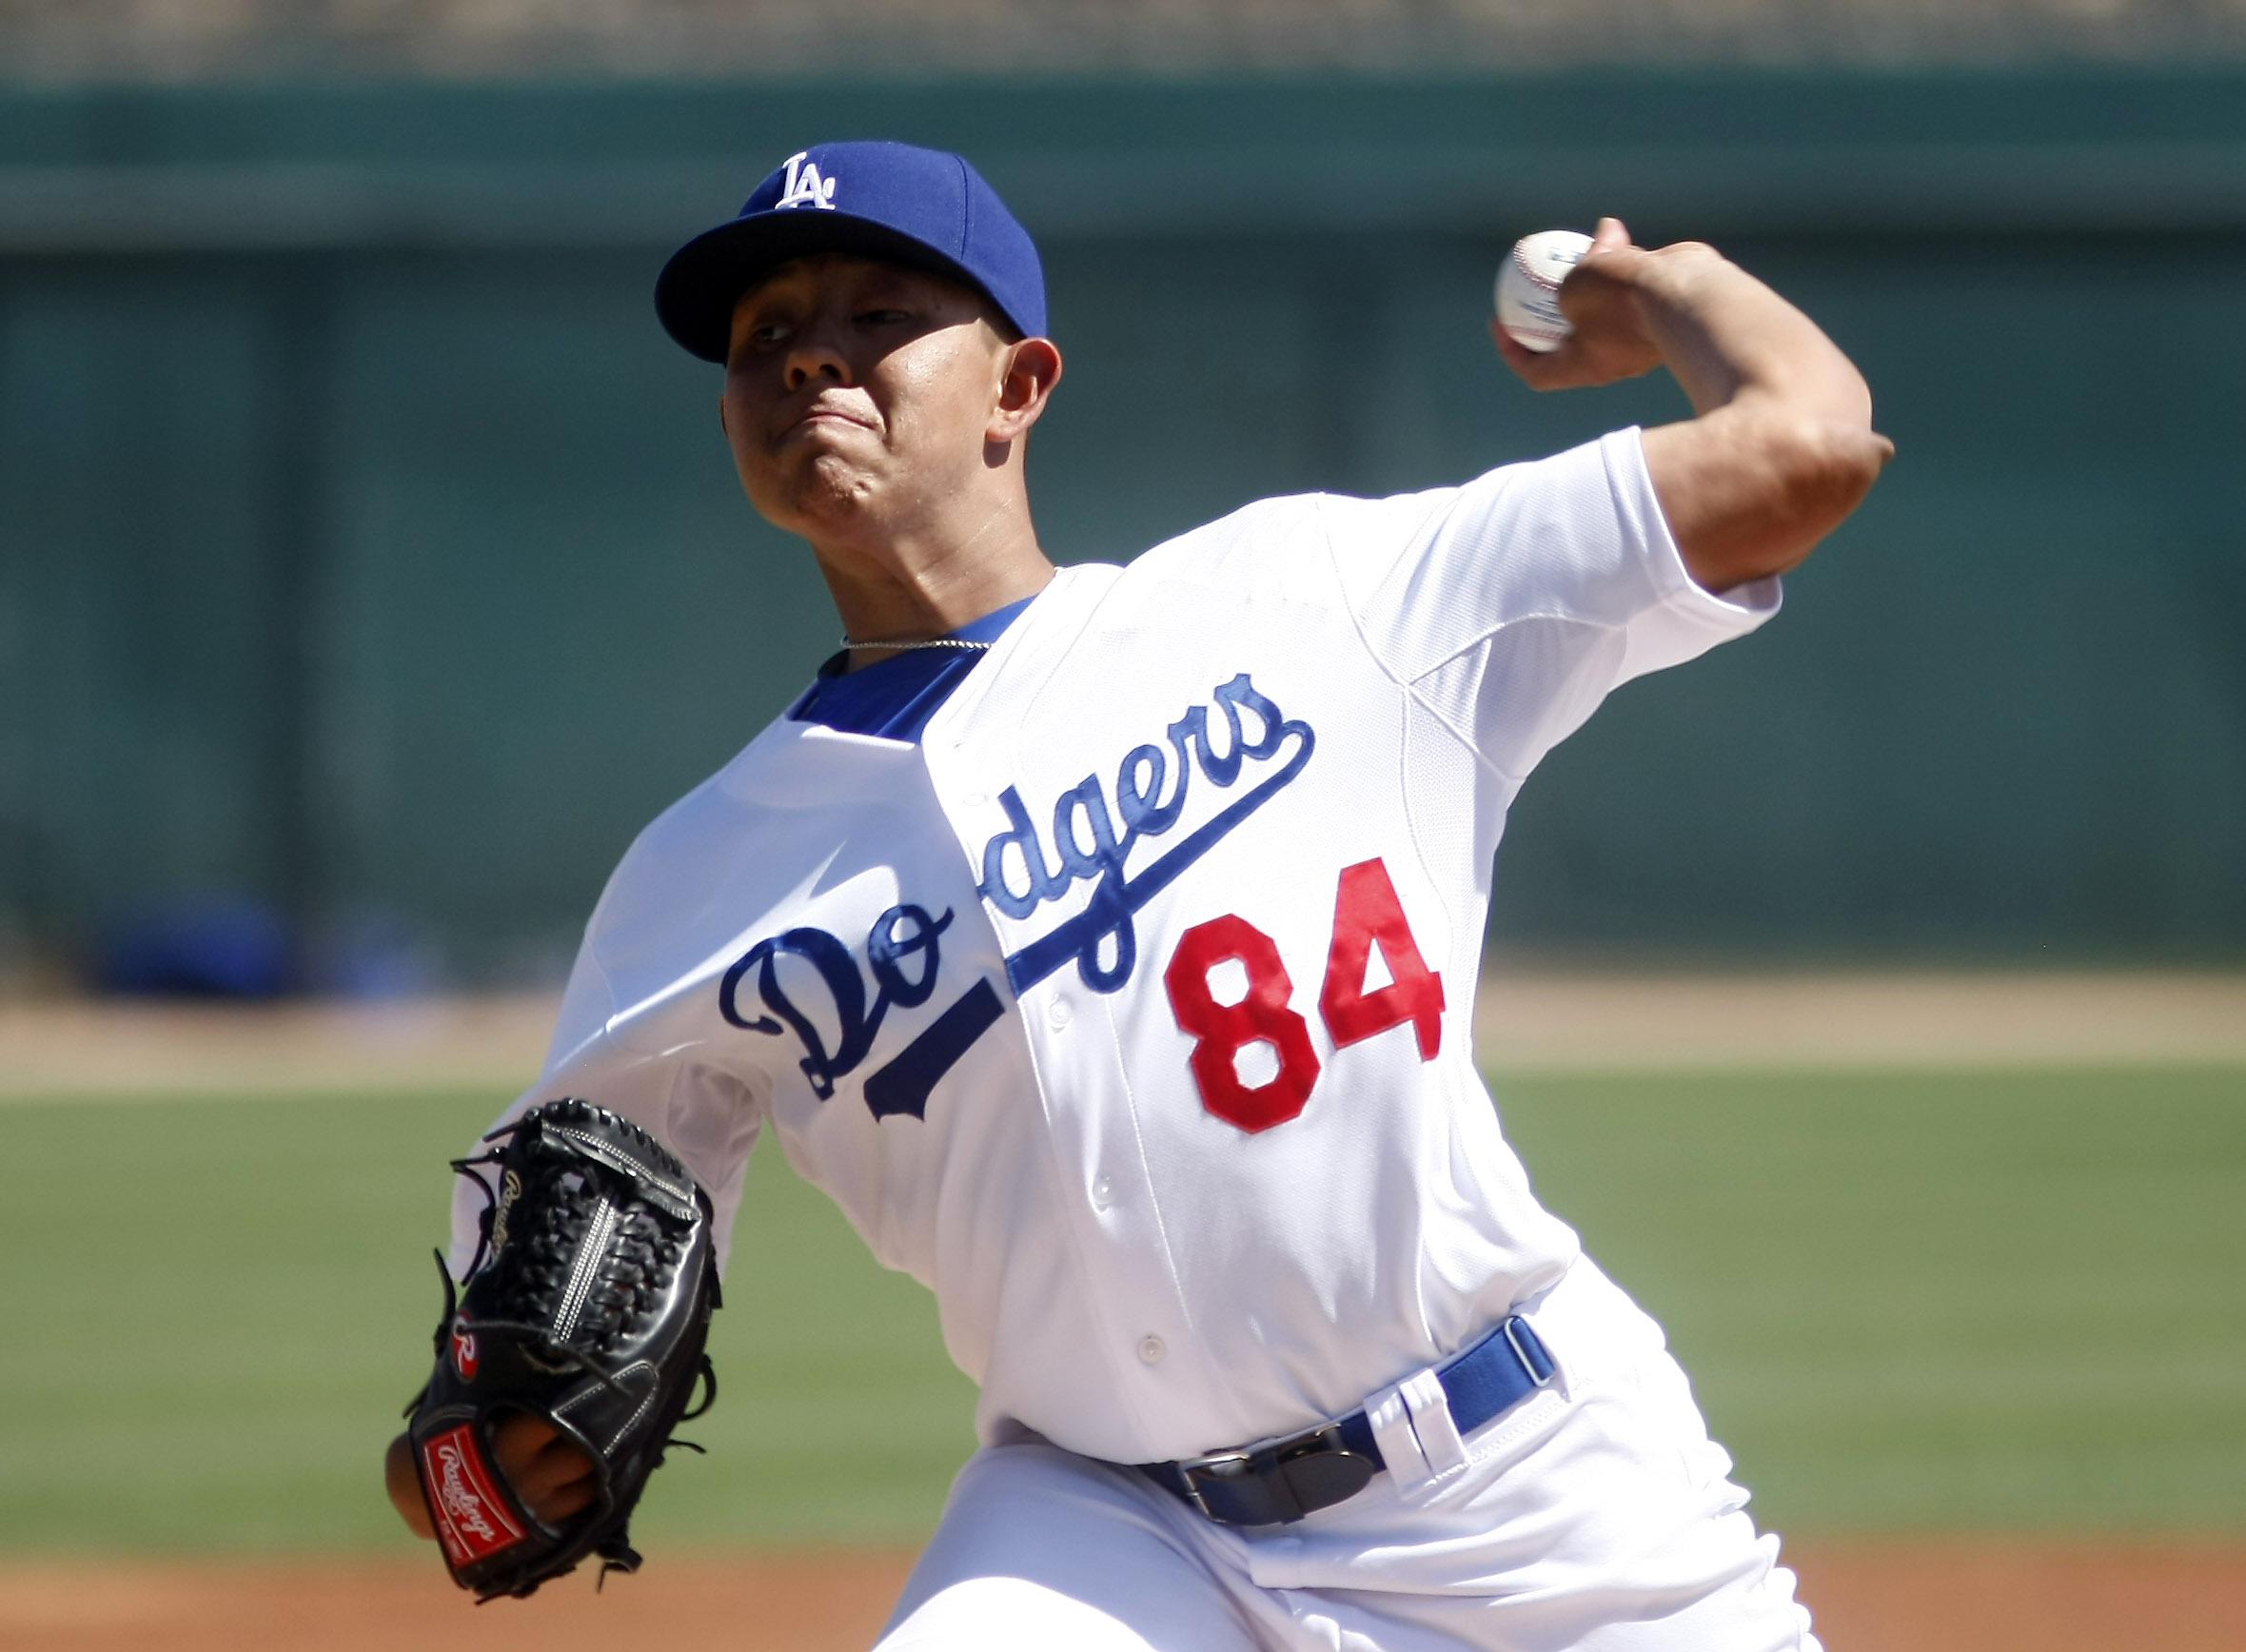 Los Angeles Dodgers pitcher Julio Urias. (USA TODAY Sports)